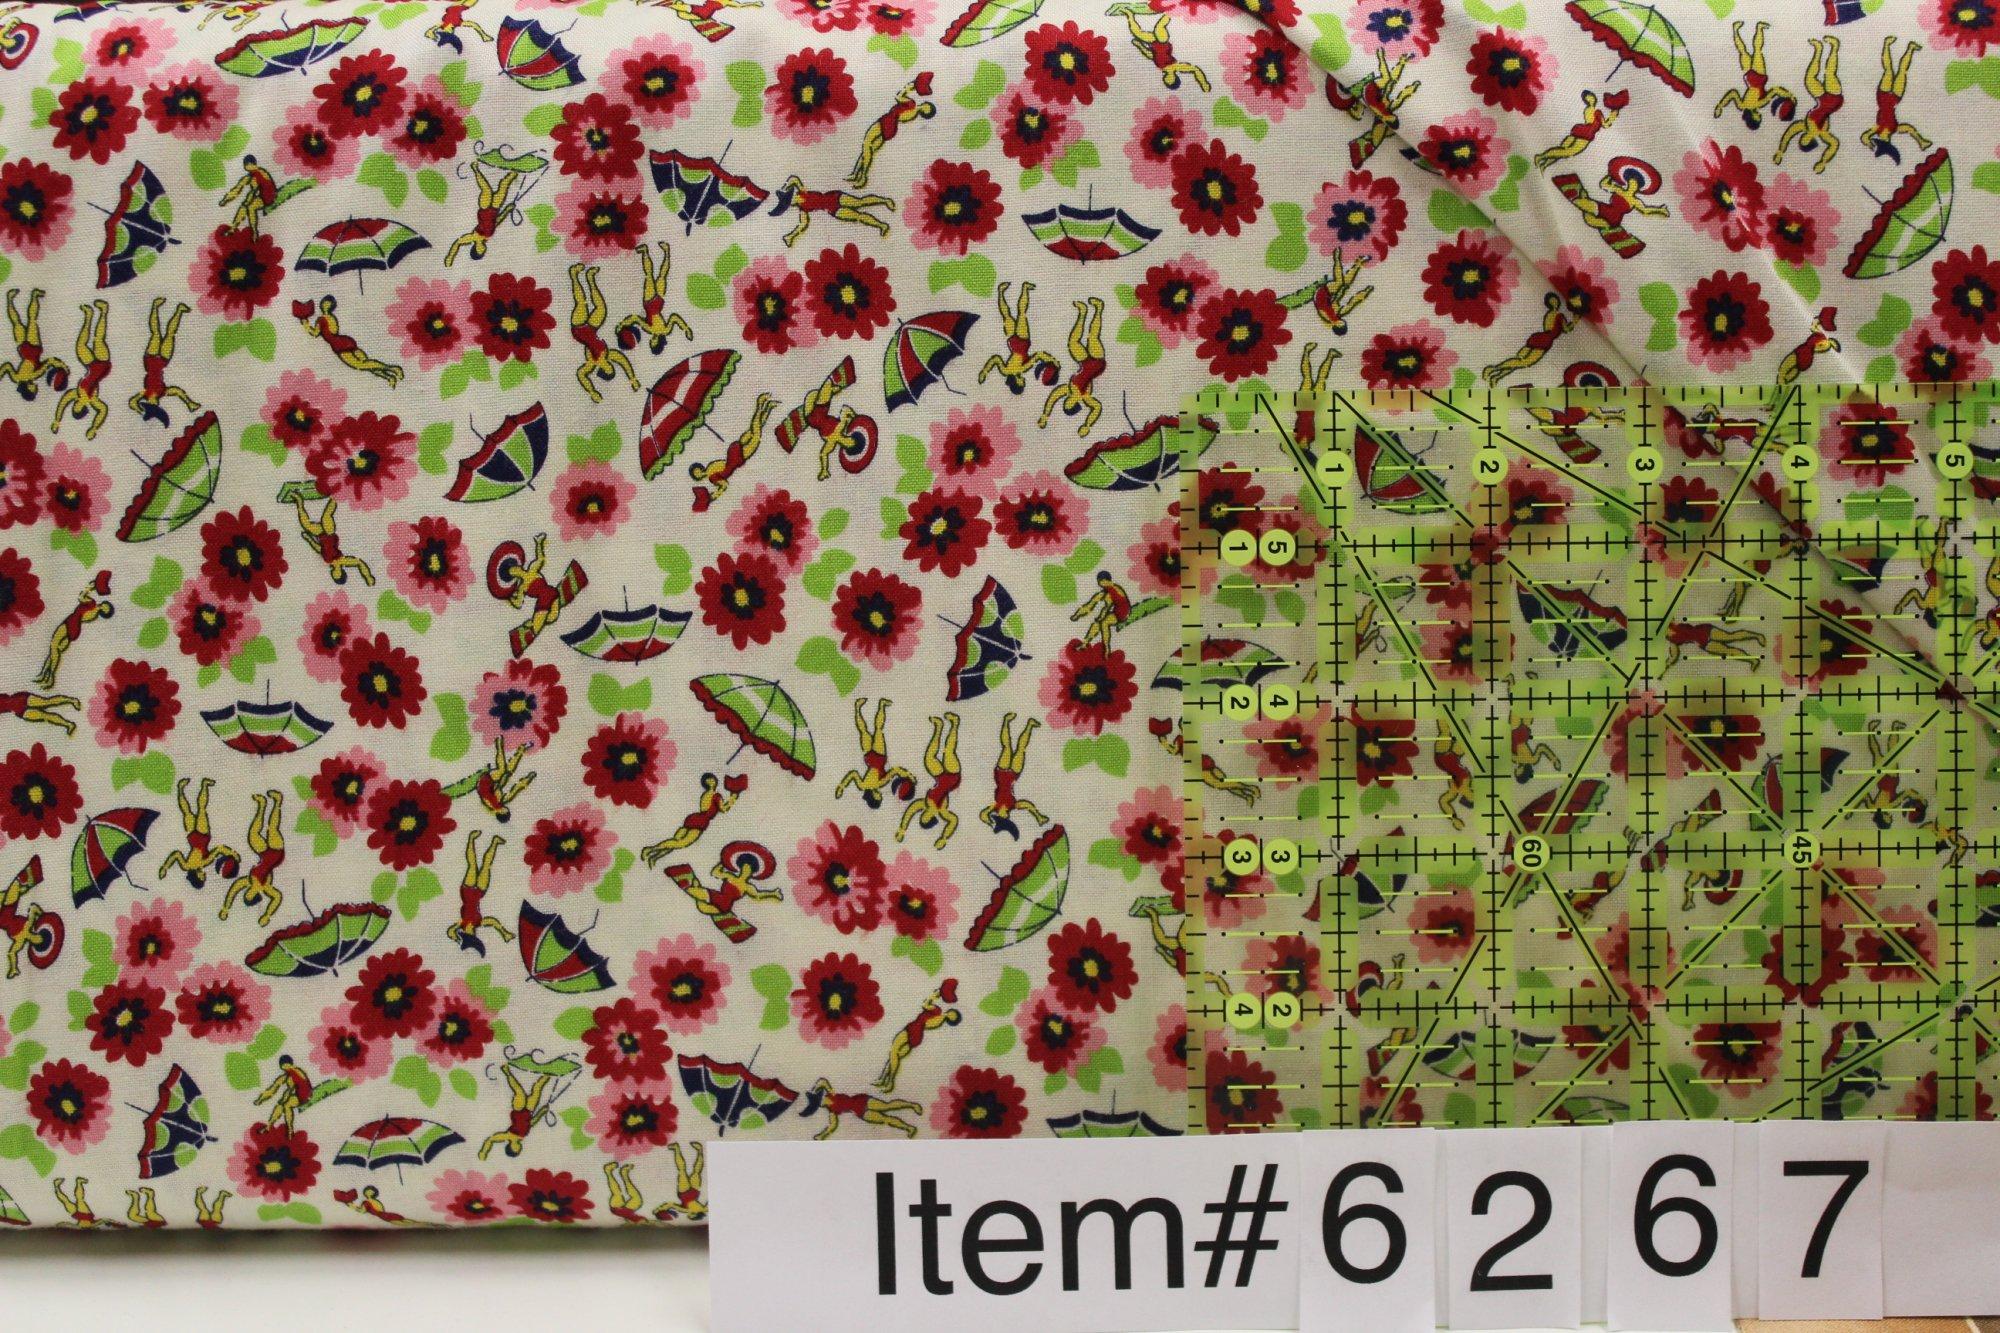 Item#6267 - Toy Box Circa 1930's - Blue Hill Fabrics - Sara Morgan - Bolt 6267